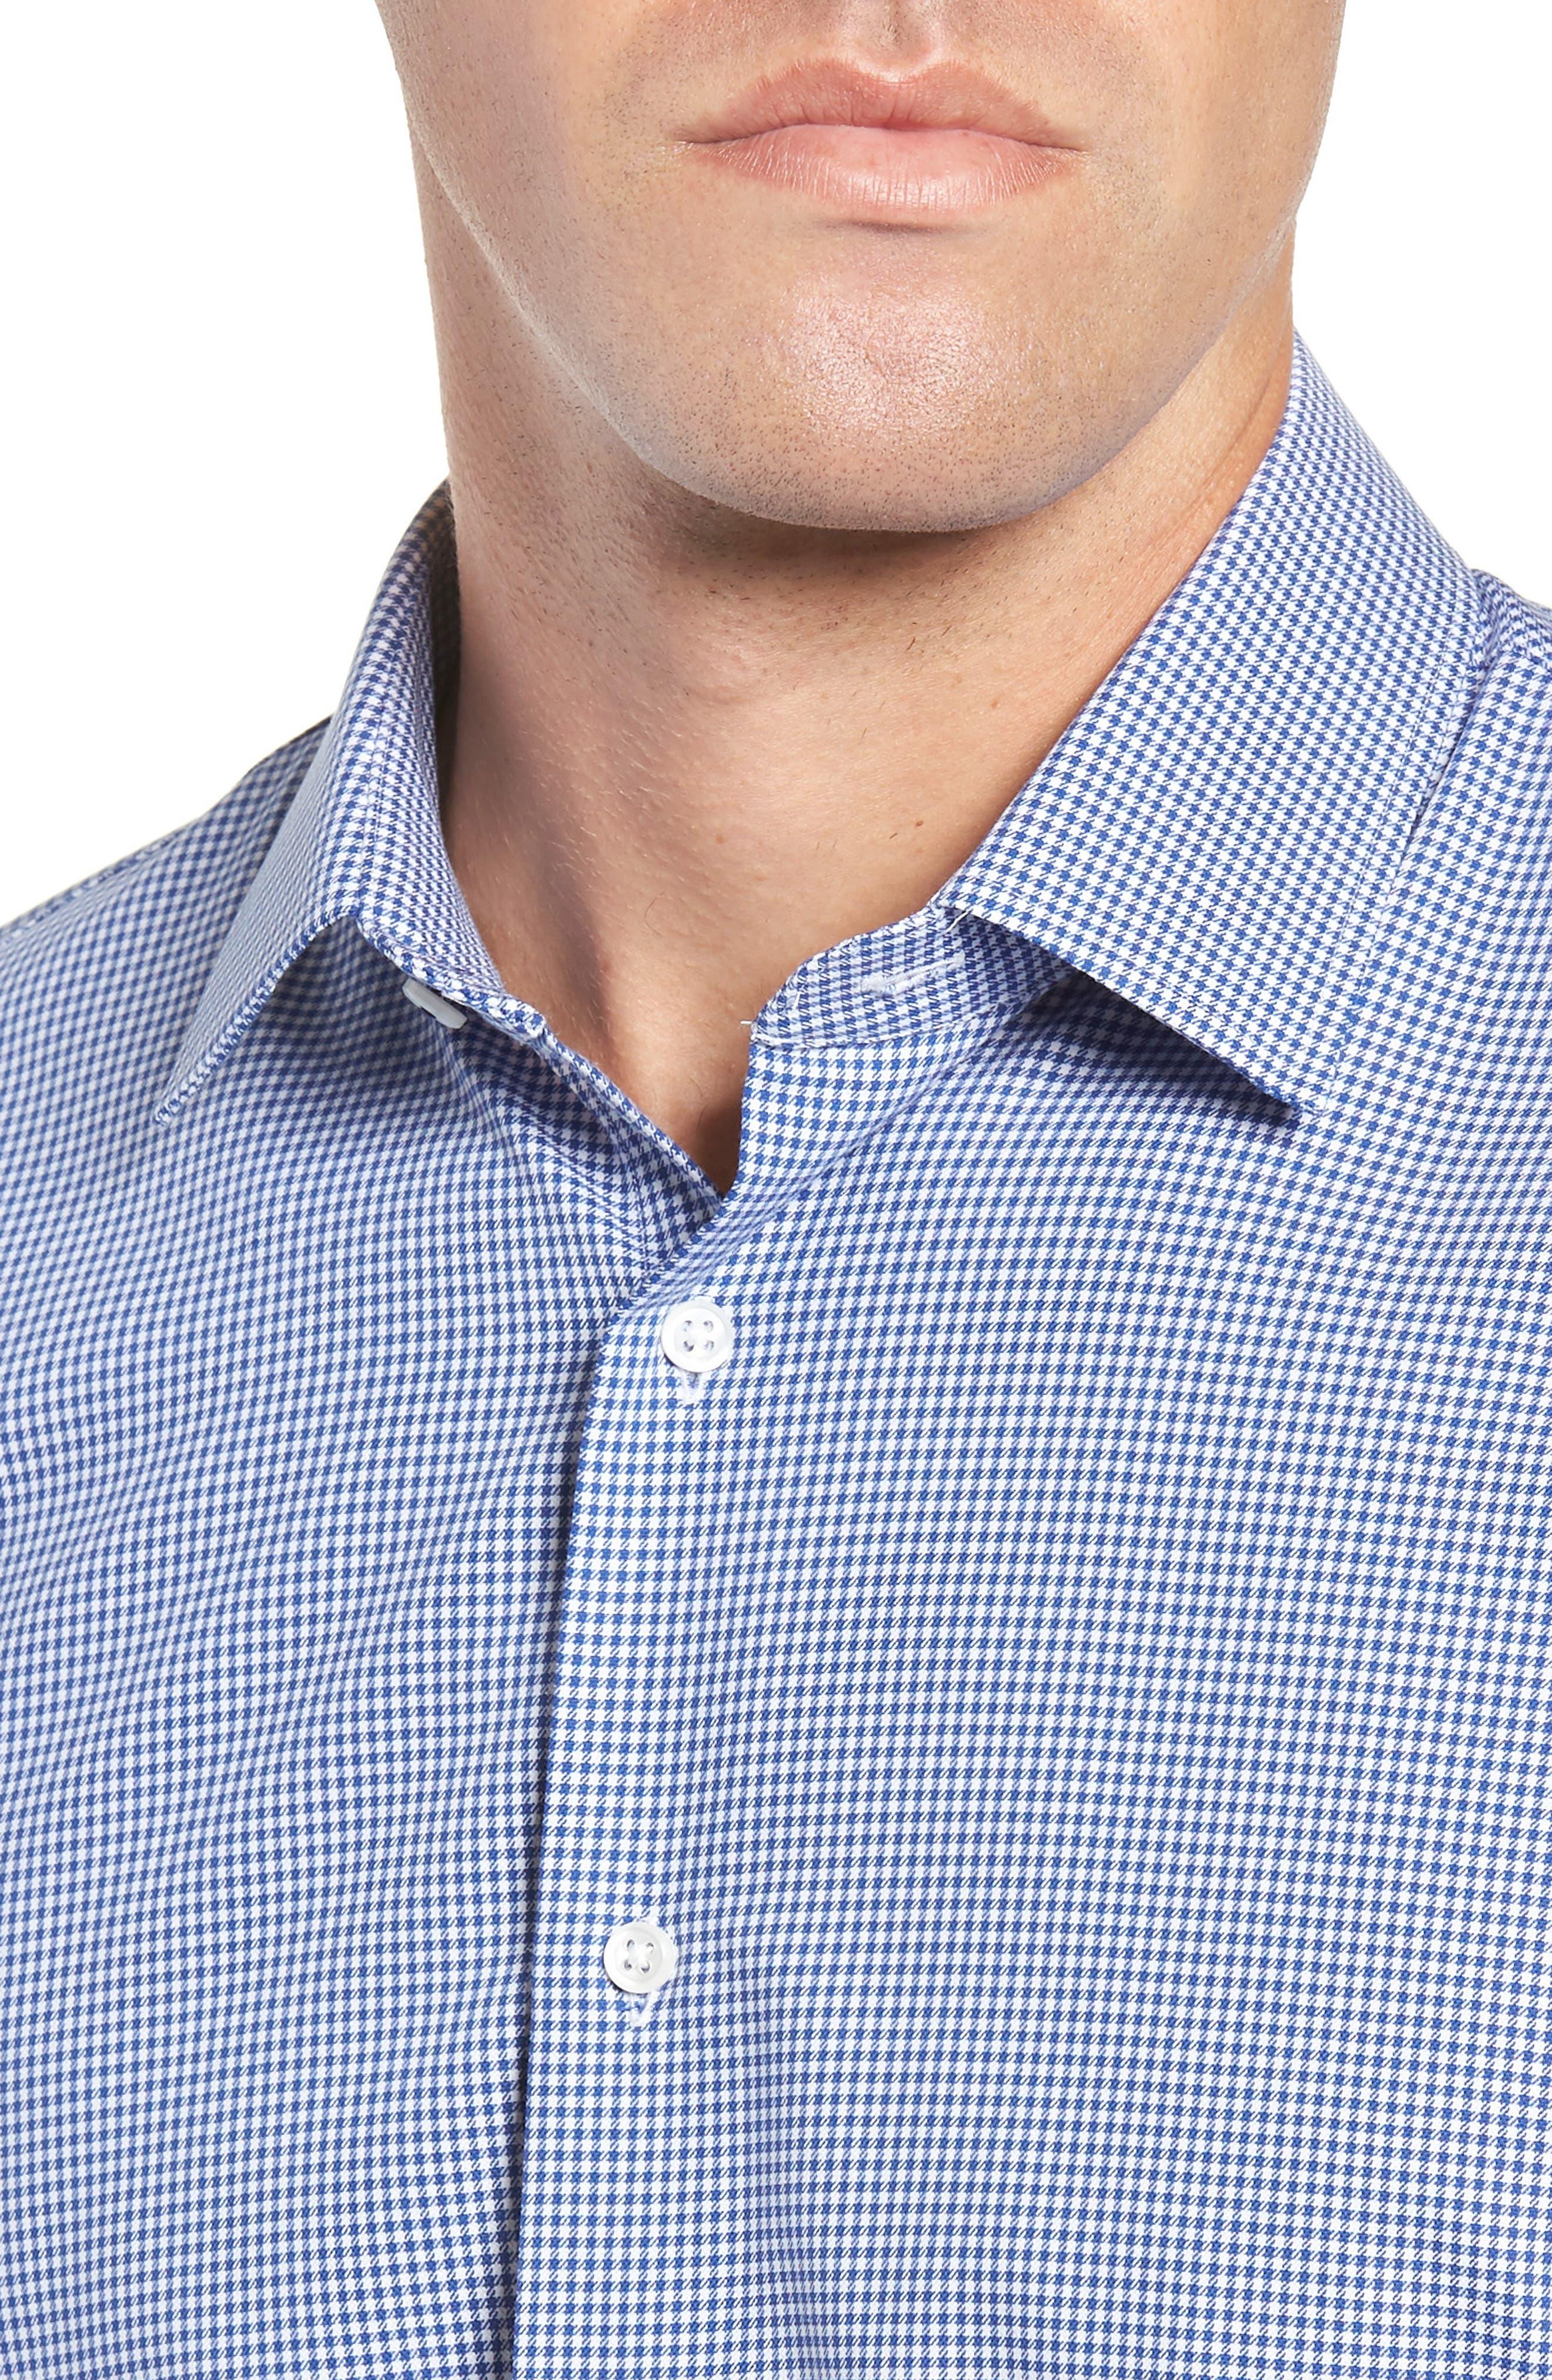 Tech-Smart Trim Fit Stretch Check Dress Shirt,                             Alternate thumbnail 2, color,                             BLUE MARINE